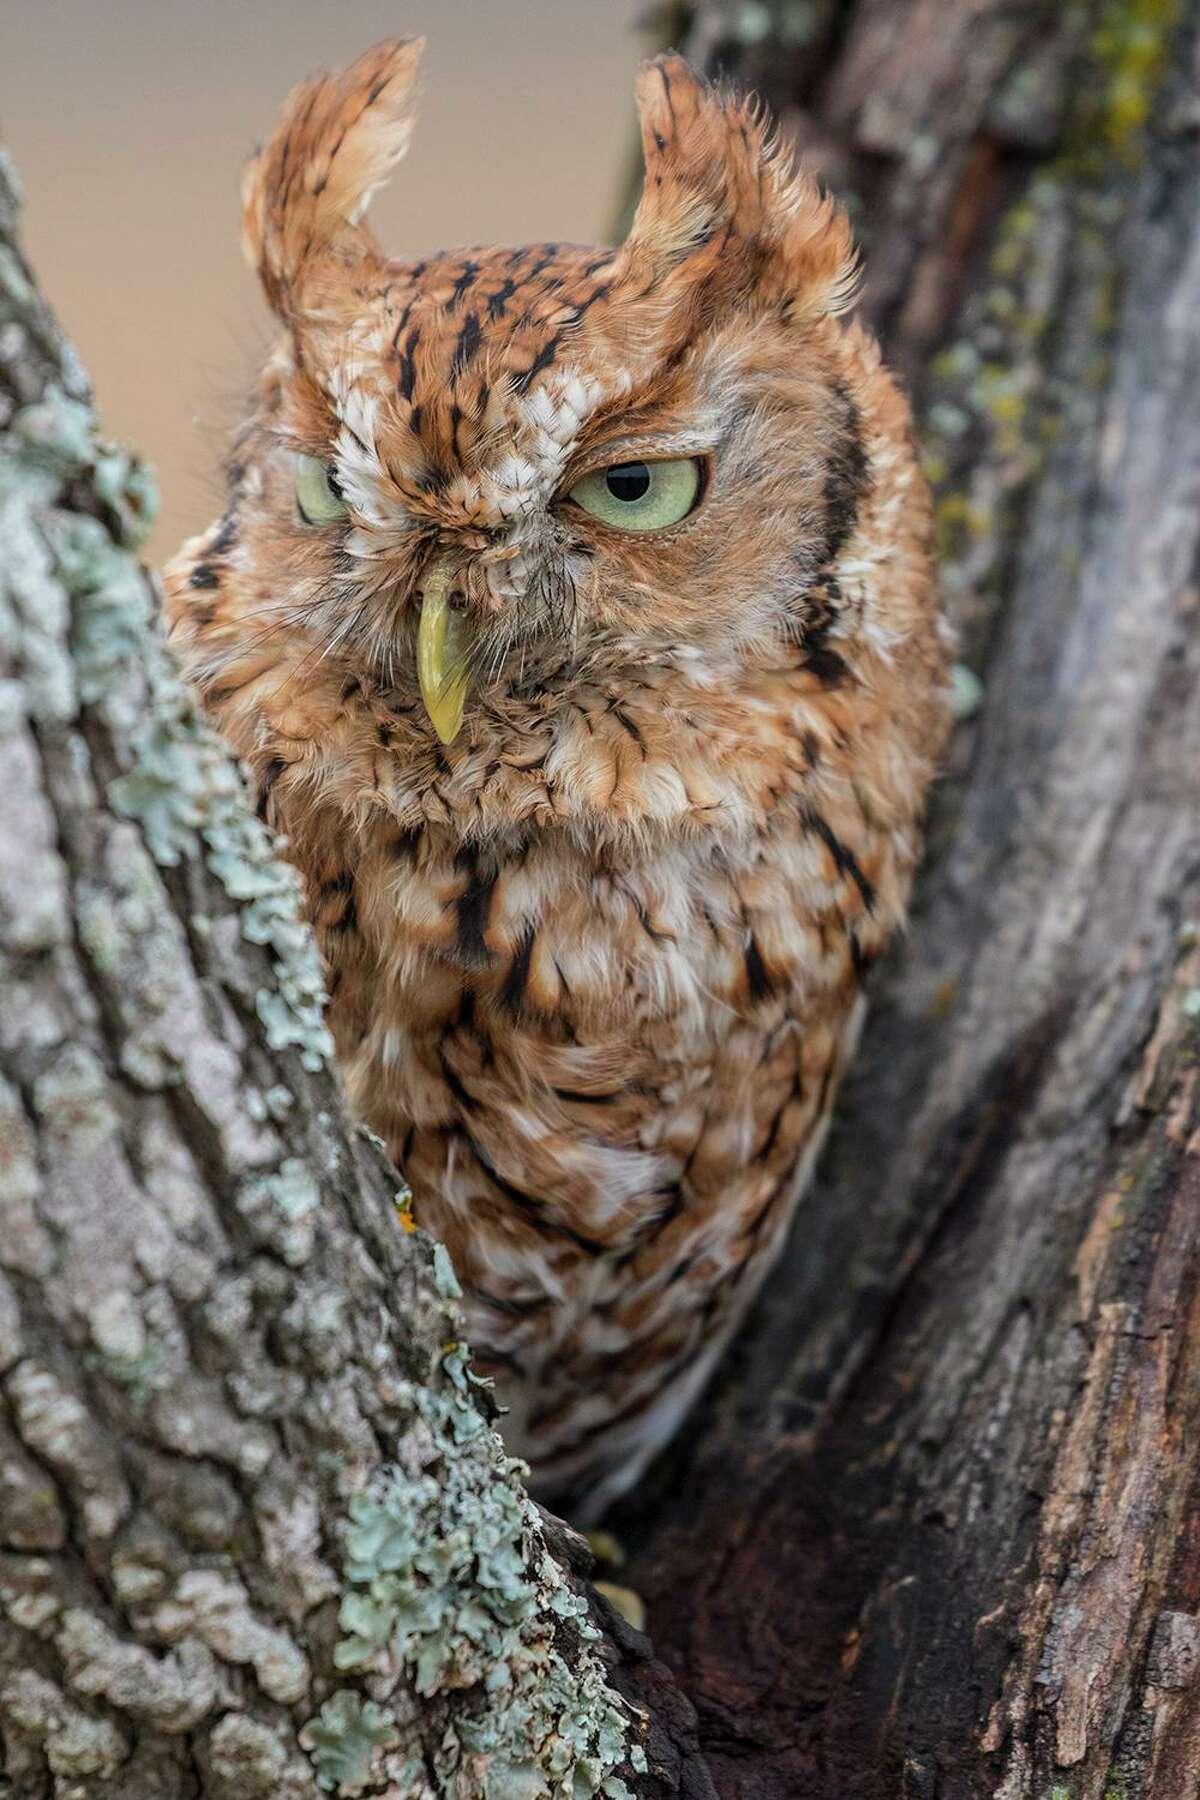 Don't miss the eastern screech-owl as it swoops in for its early morning breakfast prey.